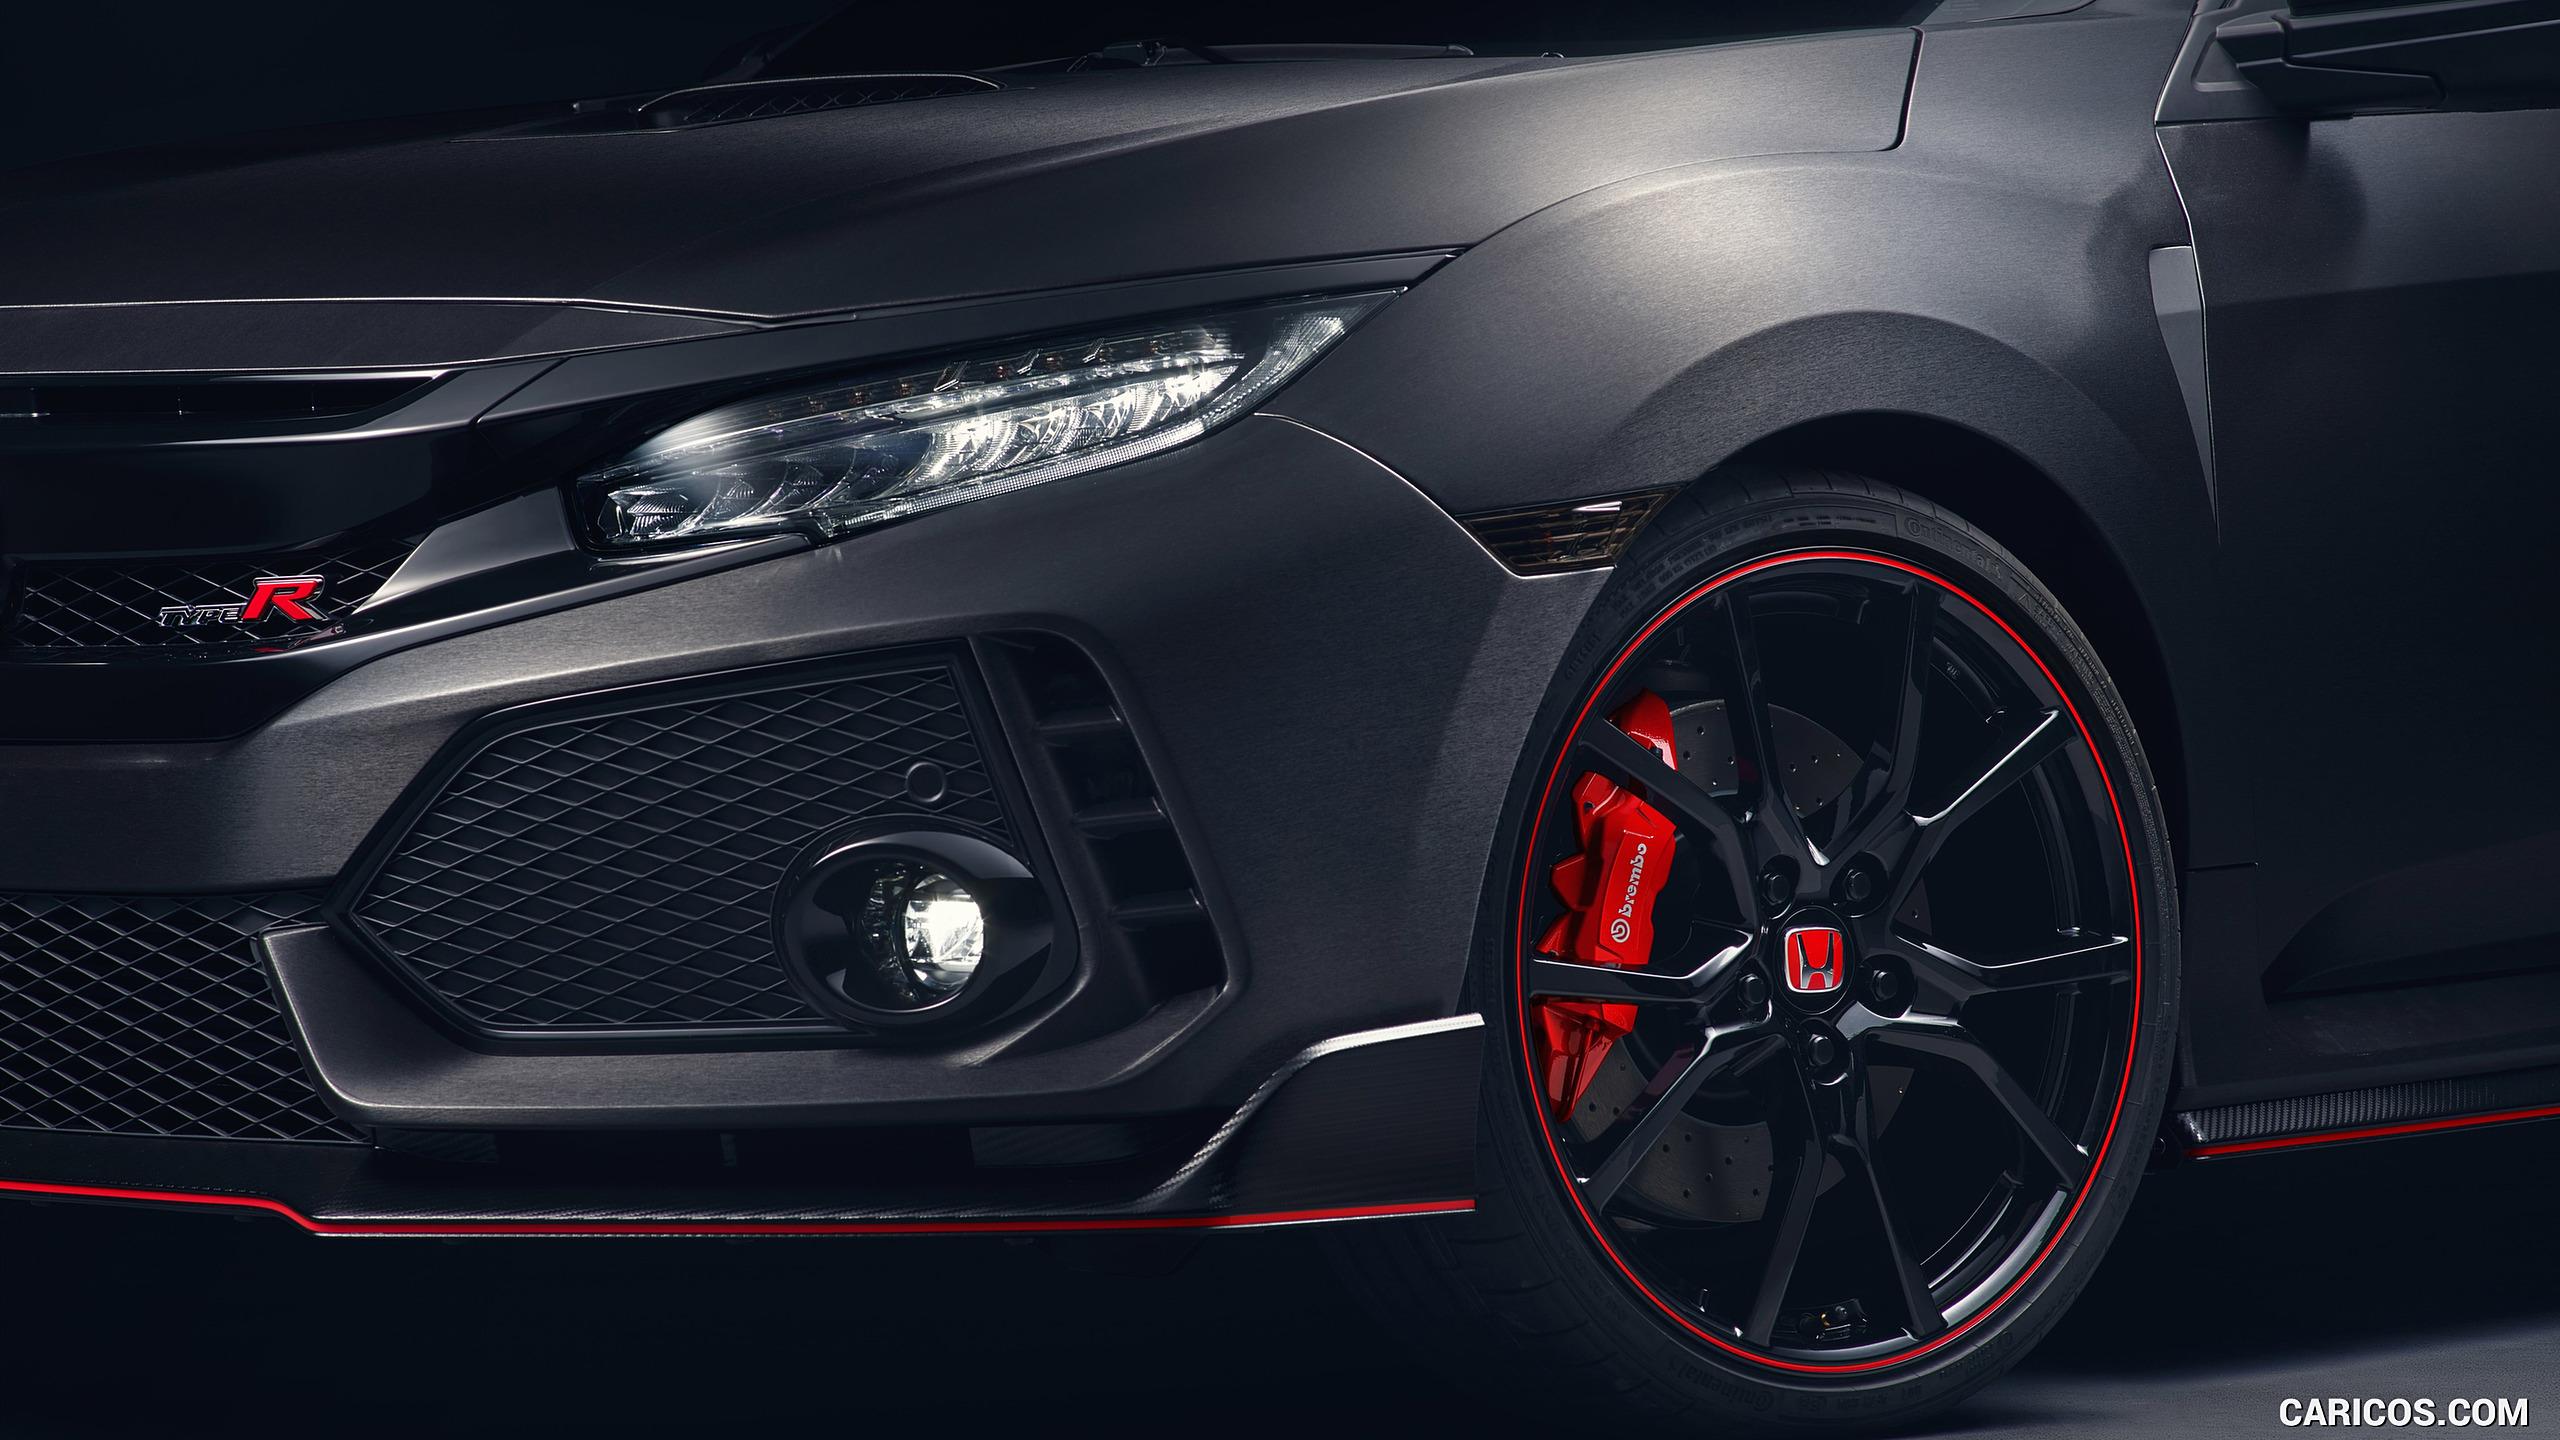 Free Download 2017 Honda Civic Type R Concept Wheel Hd Wallpaper 7